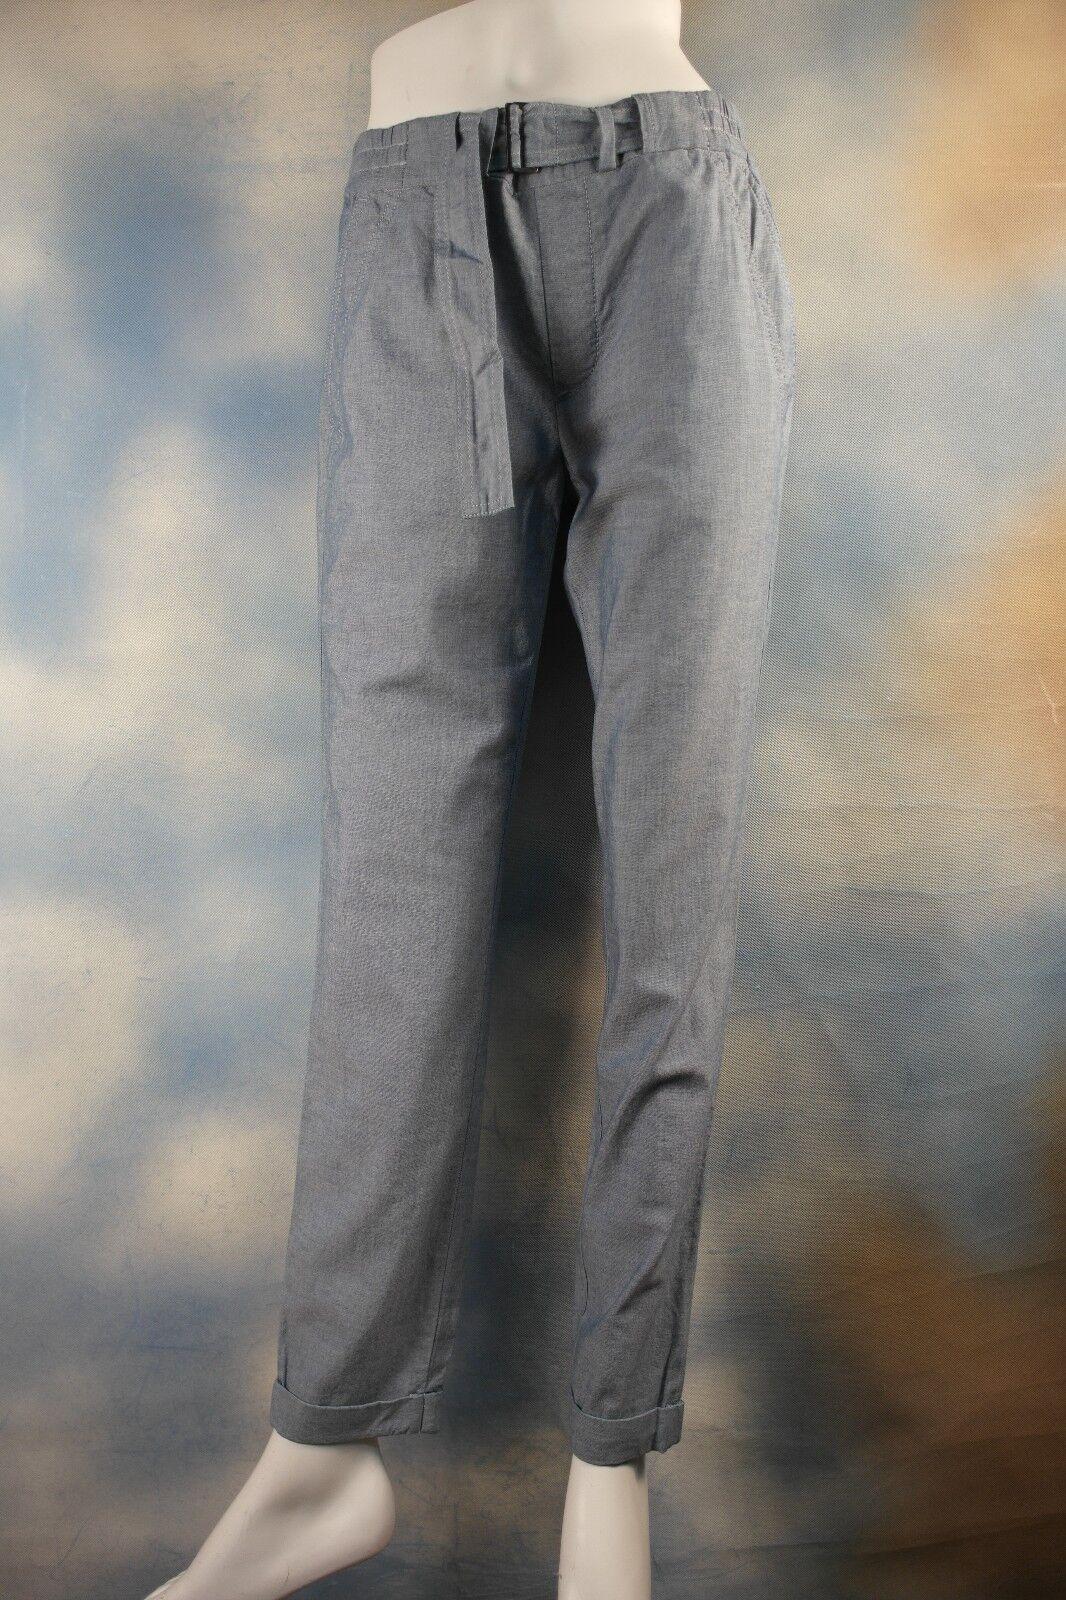 NWT  Vince bluee Soft Cotton Cuff Pants Jeans Sz S 4 6 Wow